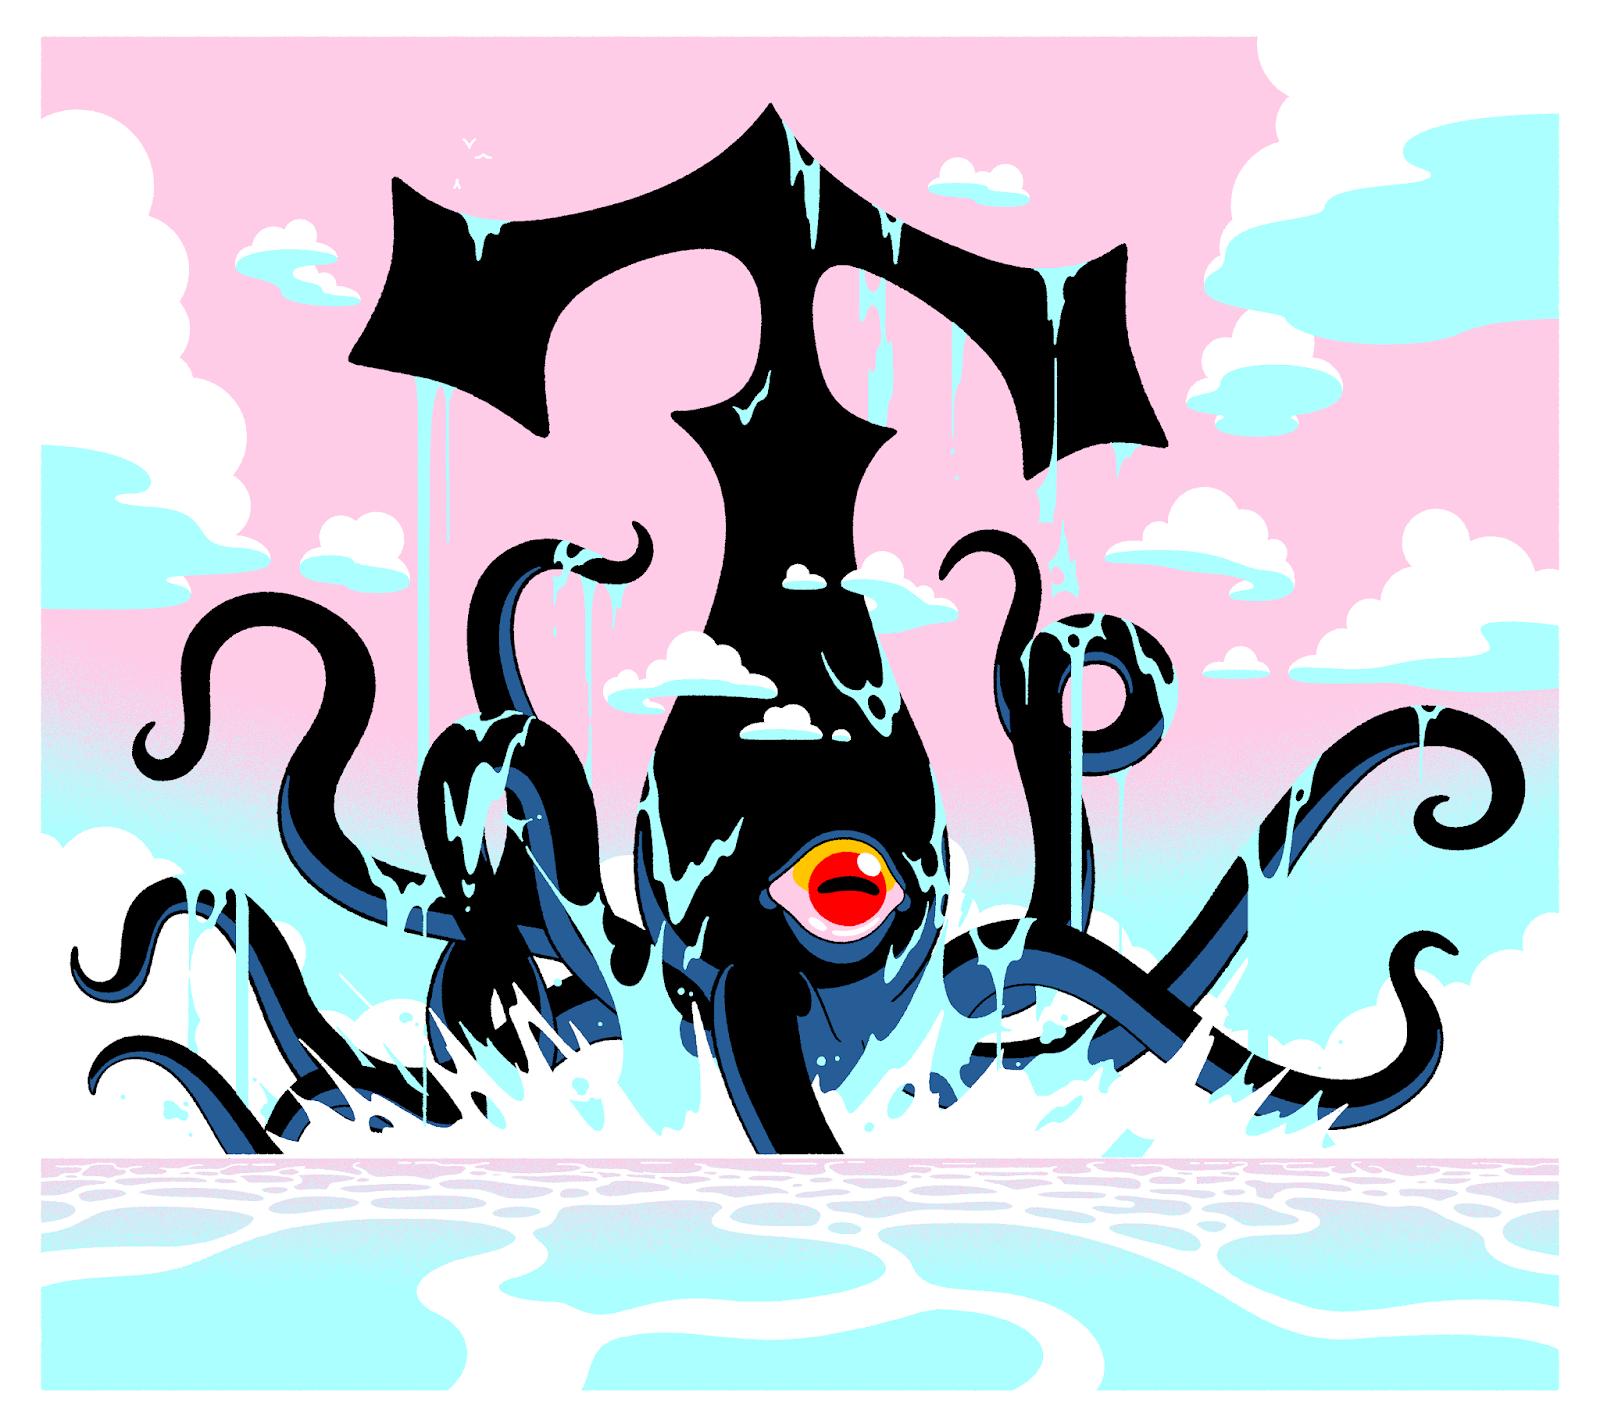 "dungeonsanddrawings ""Kraken Redux"" - by Joe Sparrow dungeonsanddrawings.blogspot.com (2018-10) © dell'autore tutti i diritti riservati"